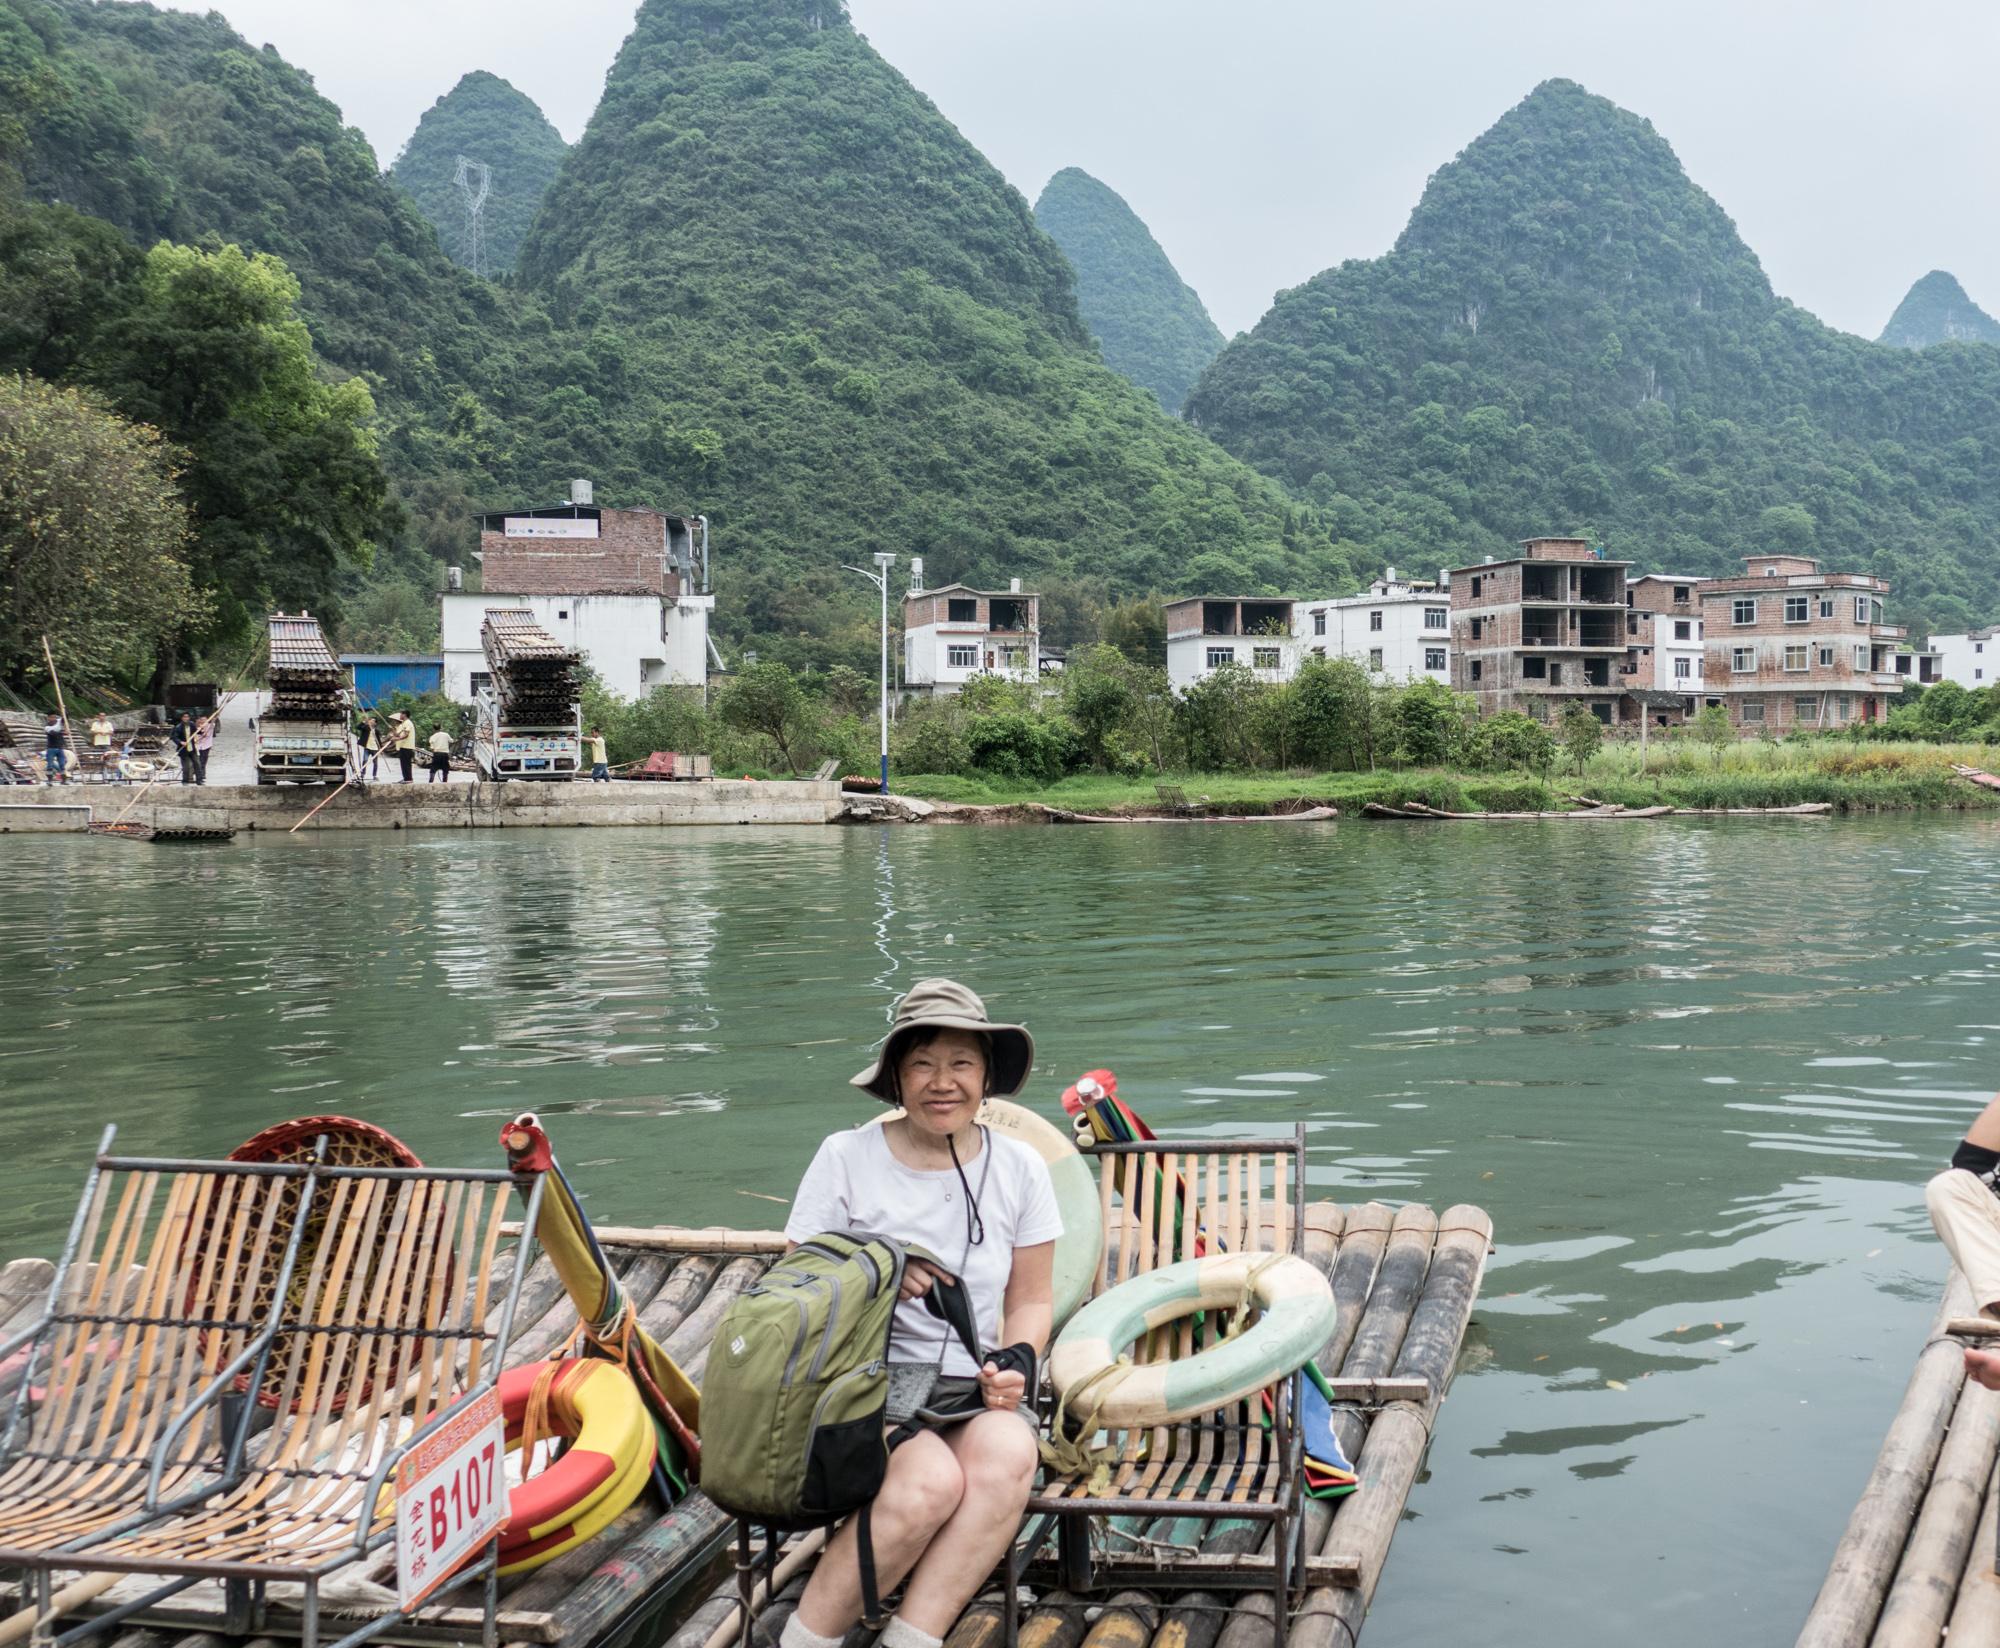 Preparing for the raft ride down the Yulong River in Yangshuo